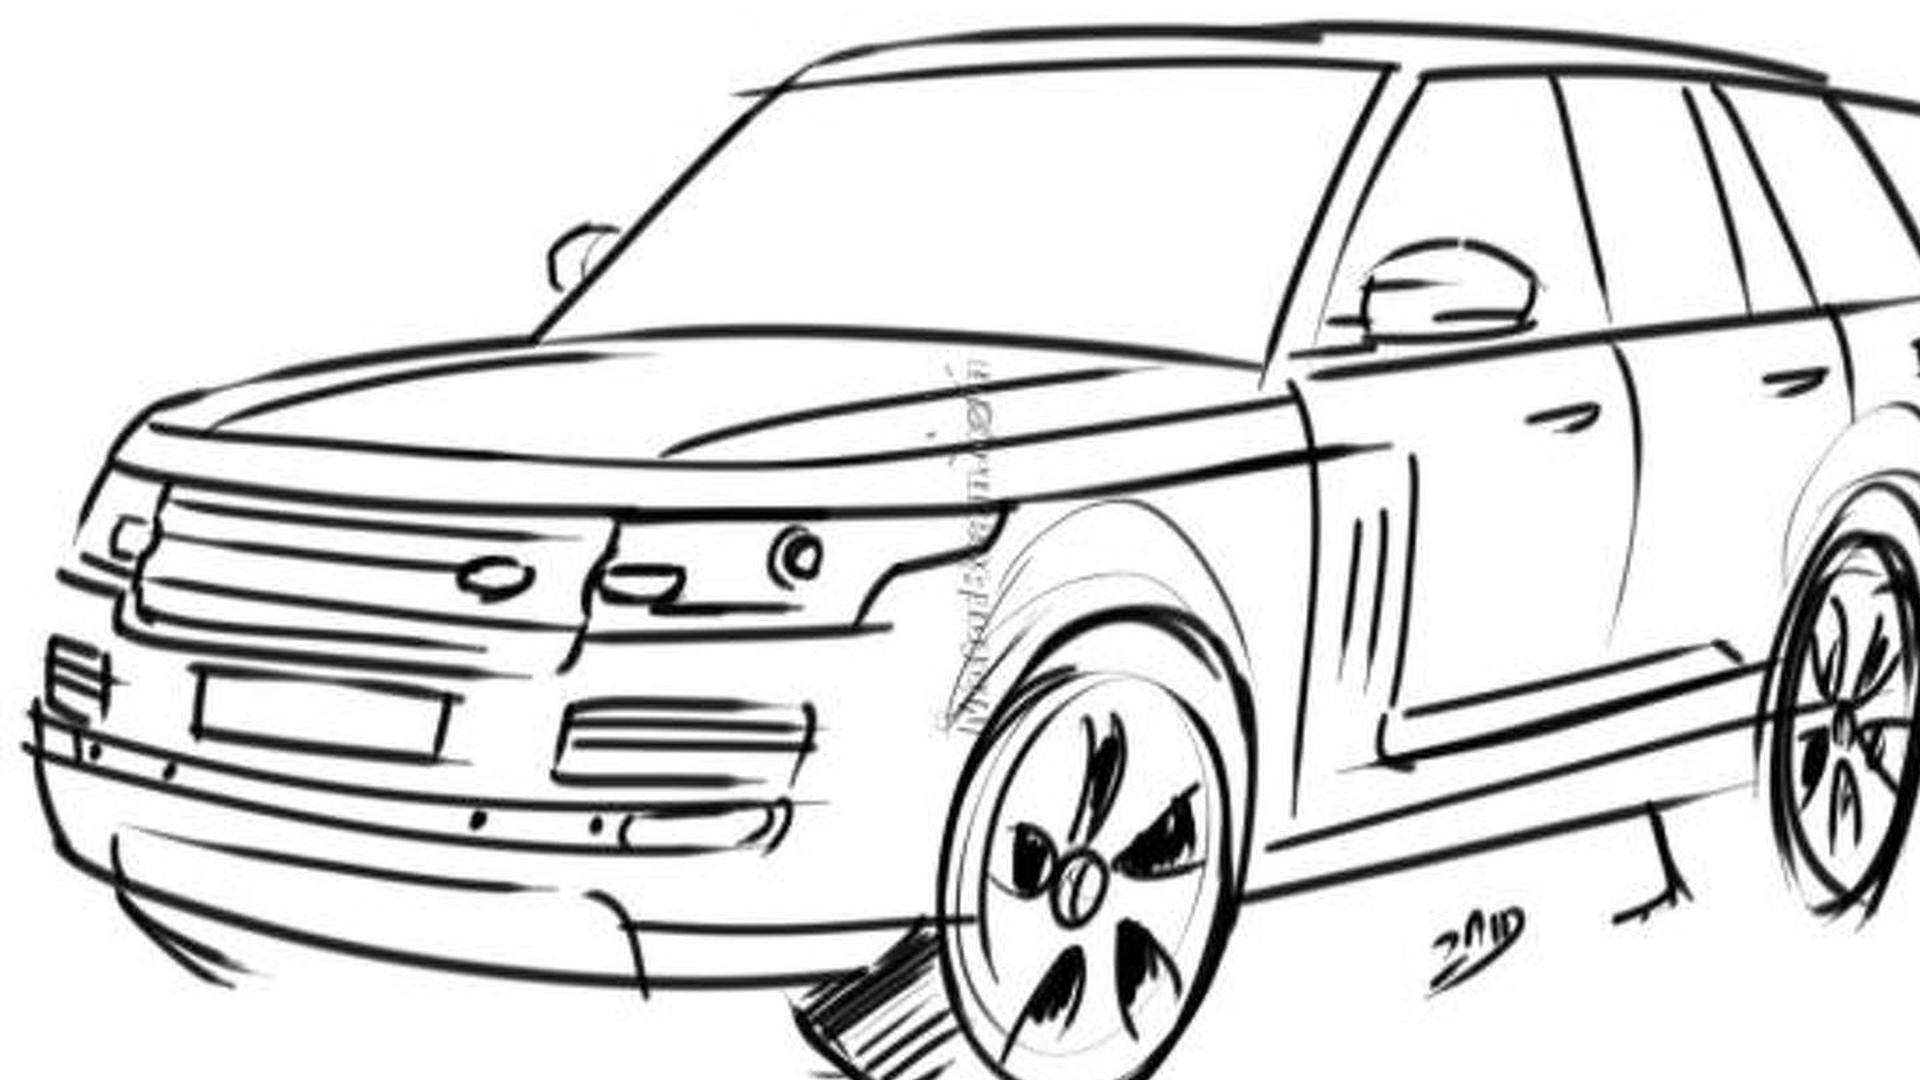 New Range Rover Speculatively Rendered